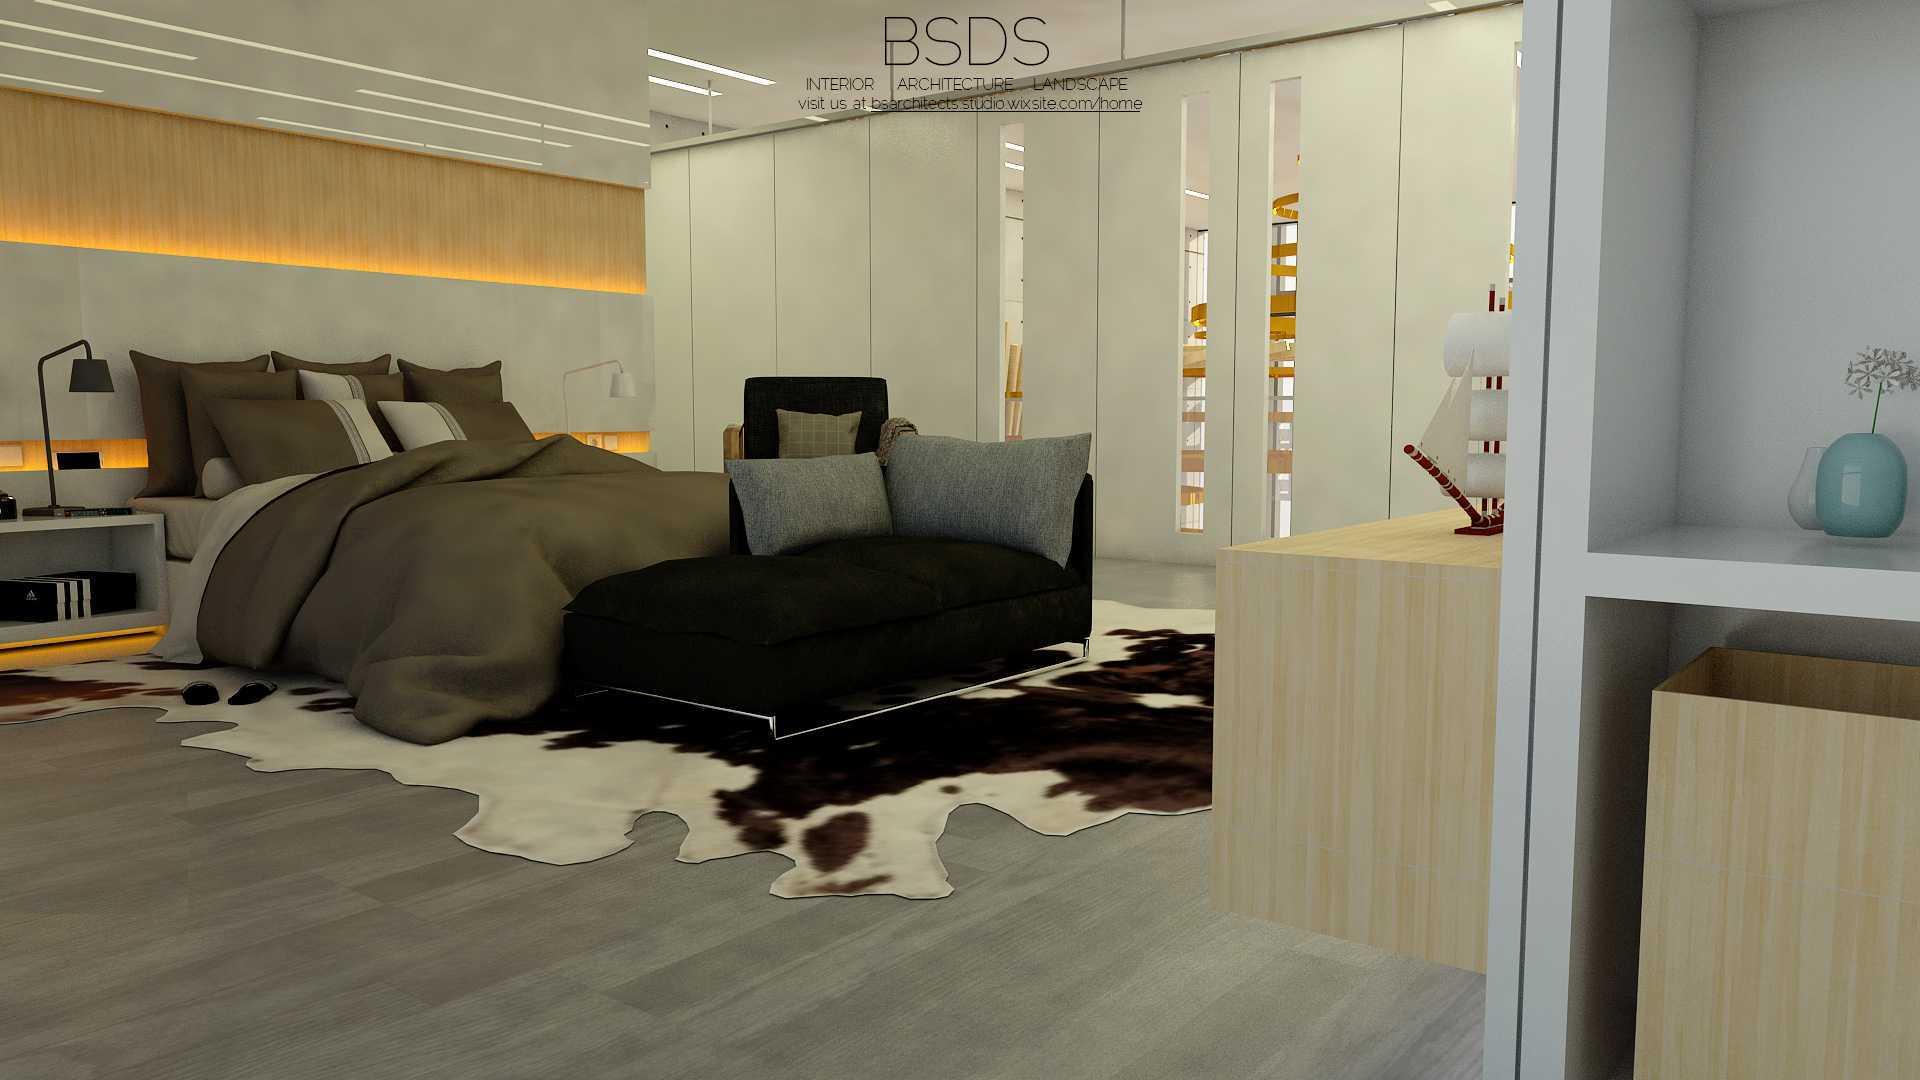 Bsds De' Flex Soho Jakarta, Daerah Khusus Ibukota Jakarta, Indonesia  Home-Floor-1 Kontemporer  34114